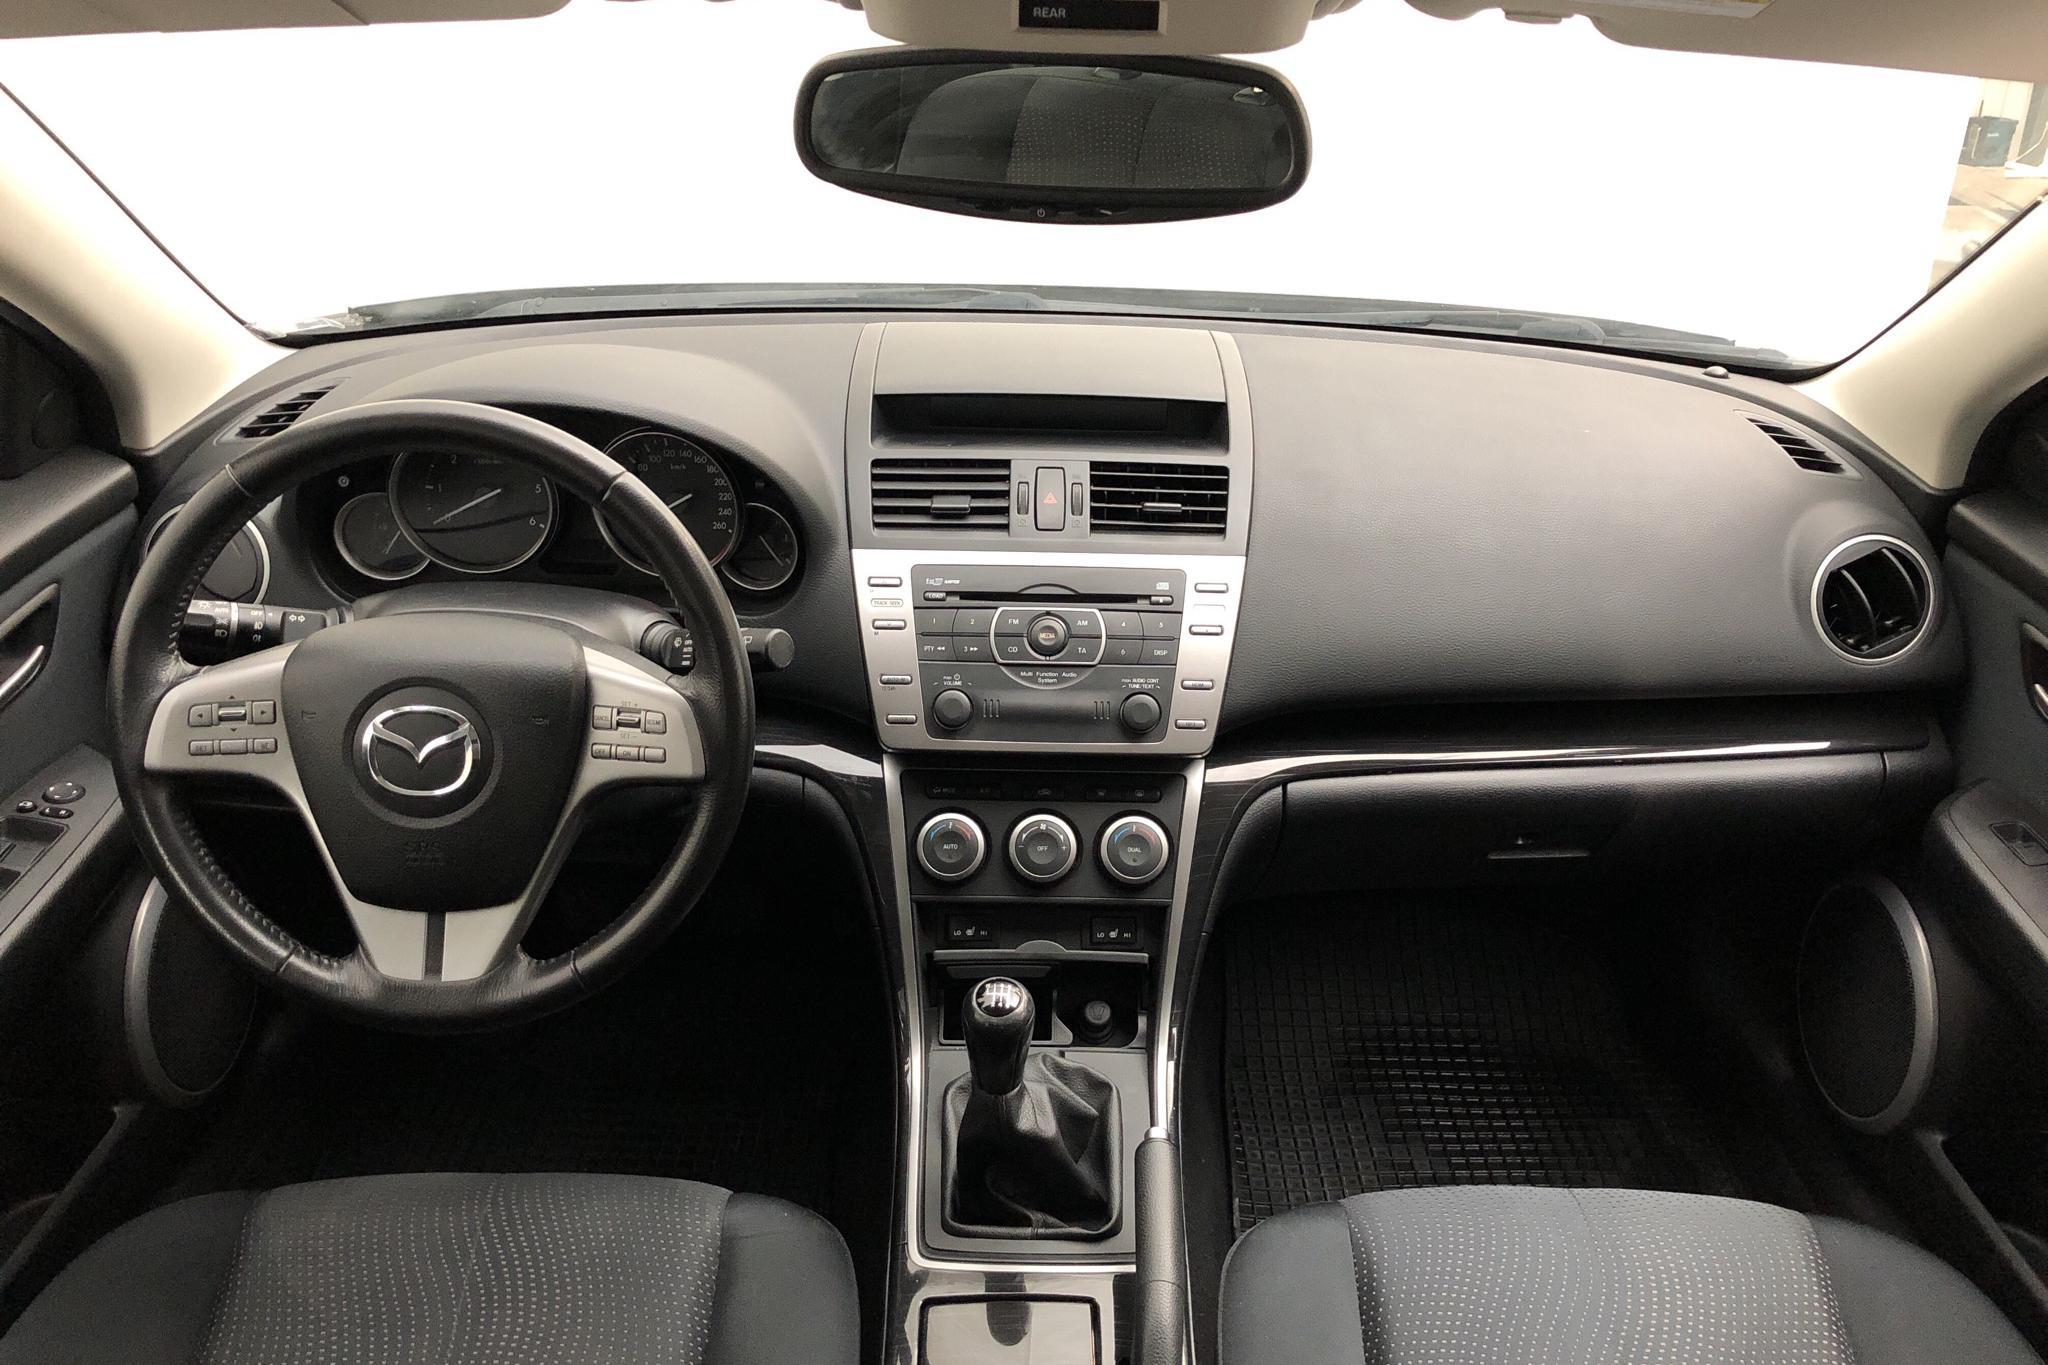 Mazda 6 2.2 D Kombi (163hk) - 13 280 mil - Manuell - grå - 2010